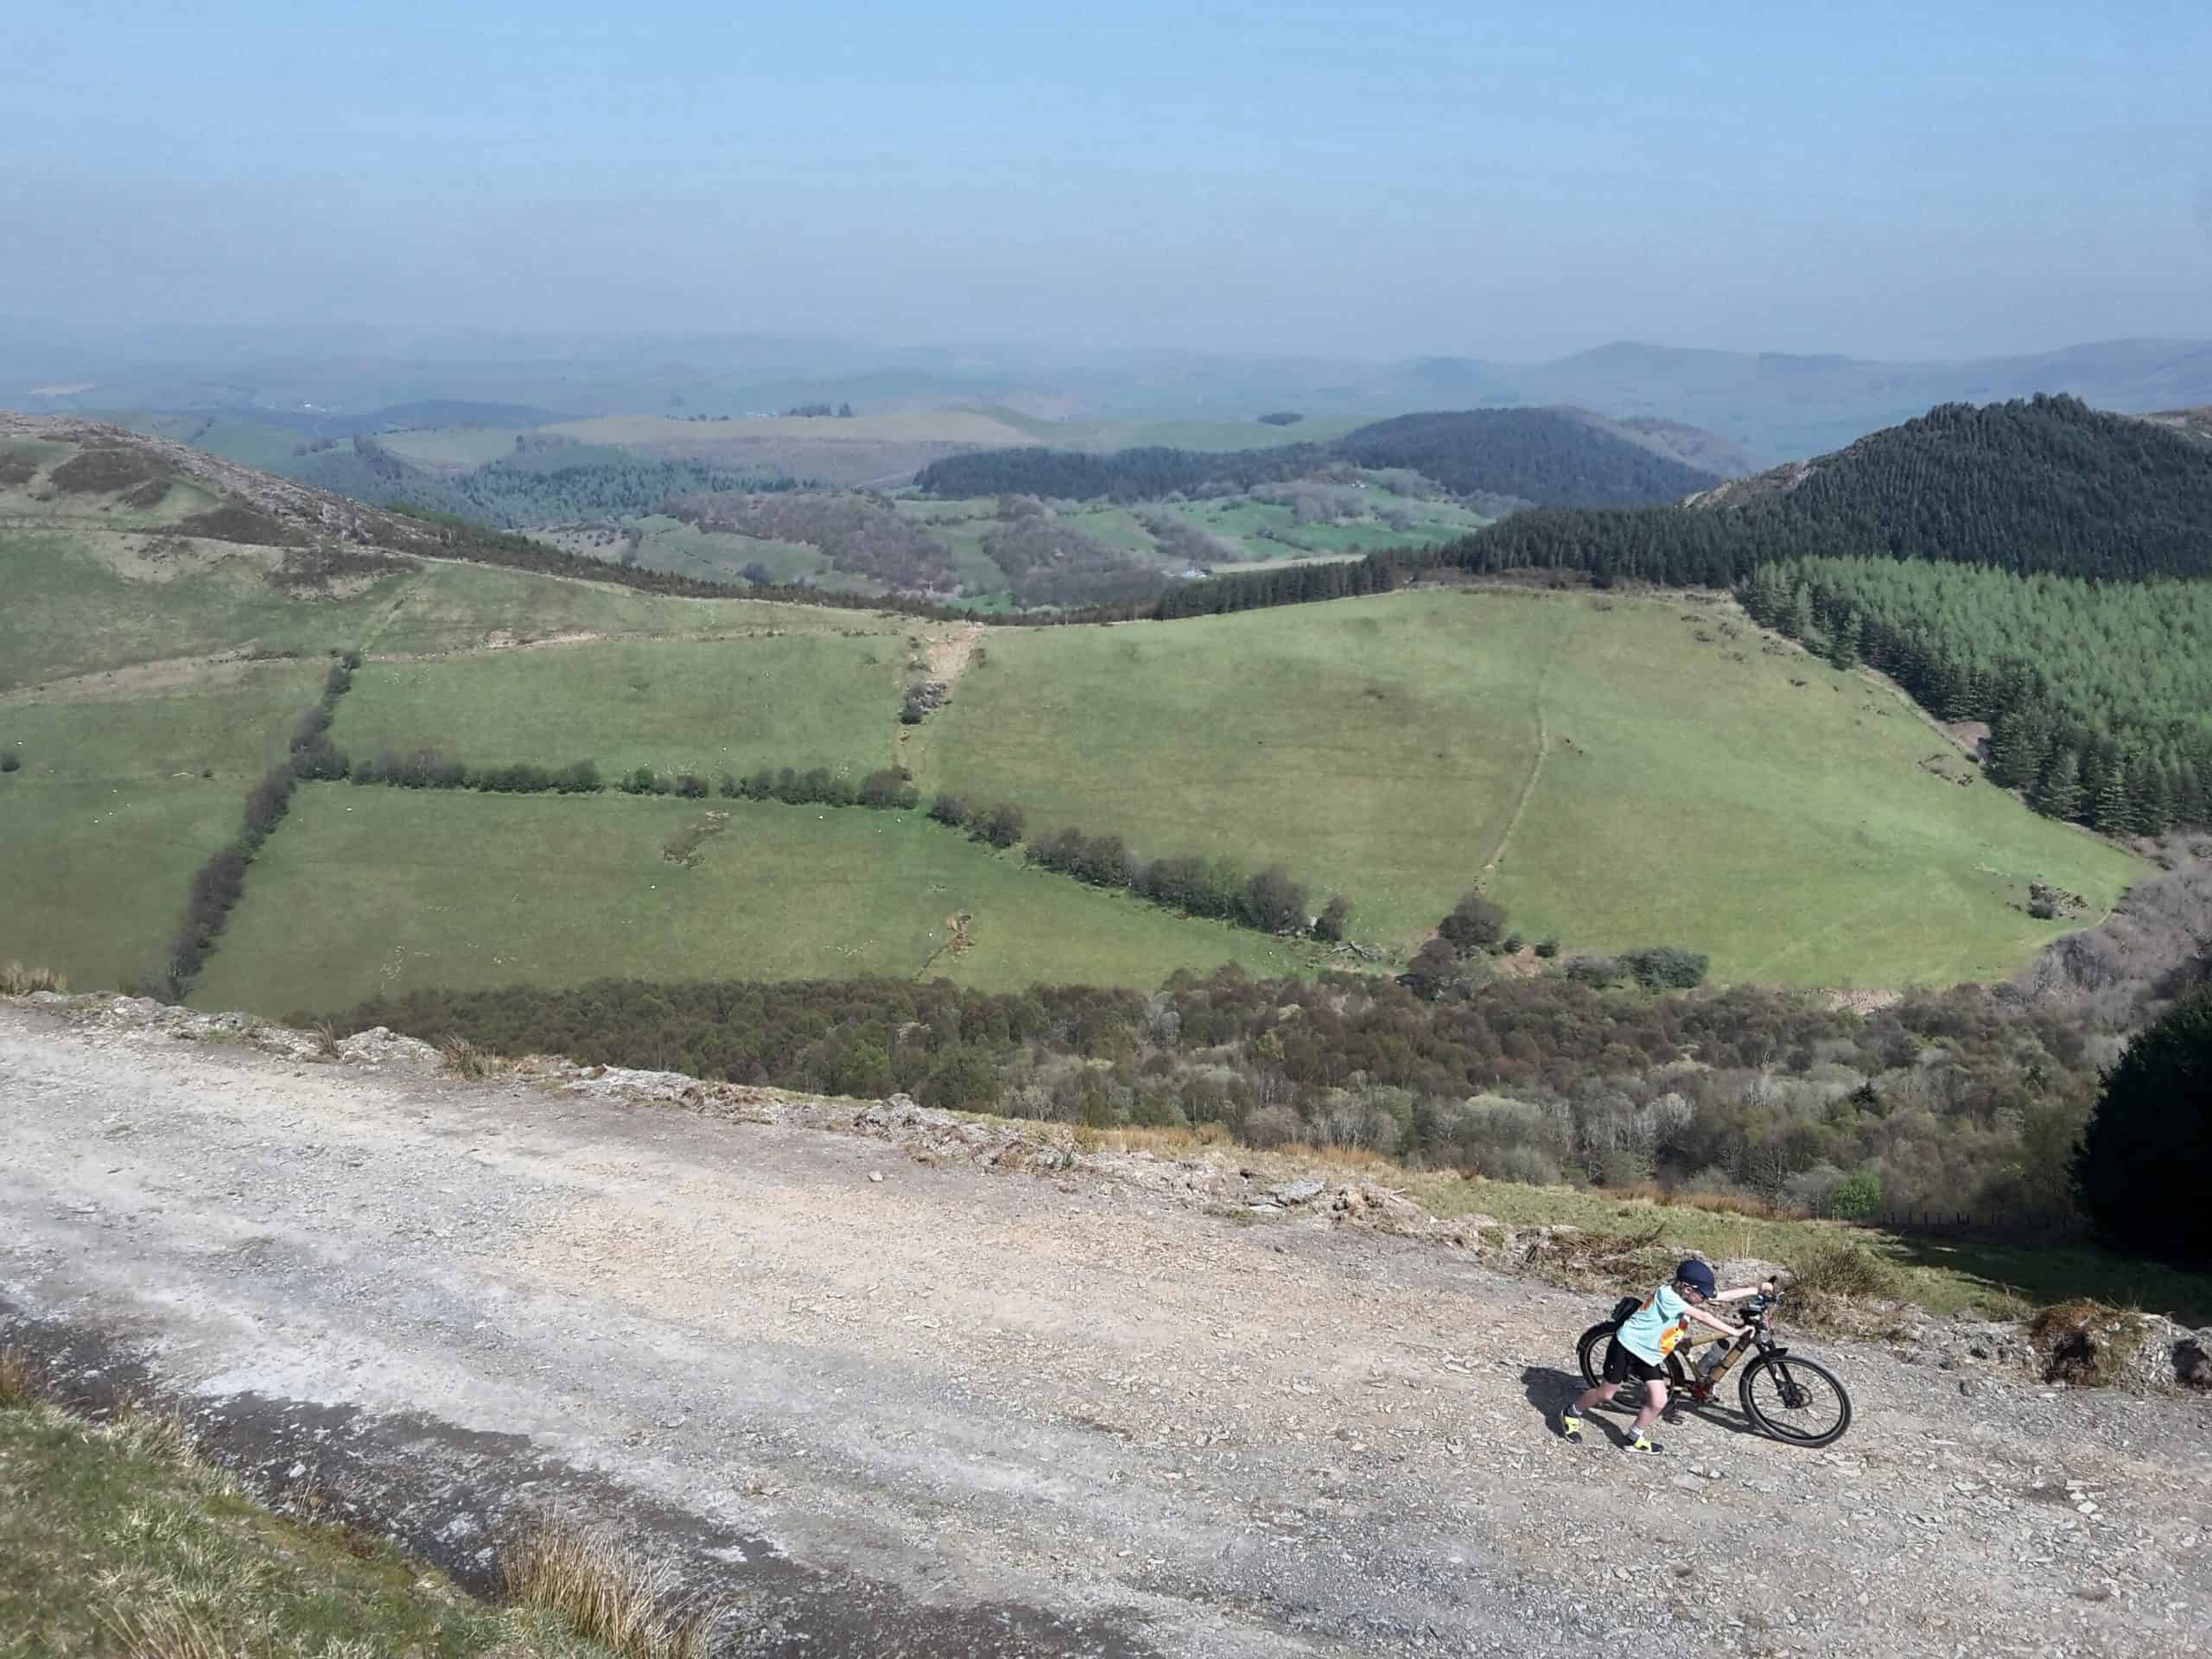 Snowdonia: Climbing Up, Riding Back 85